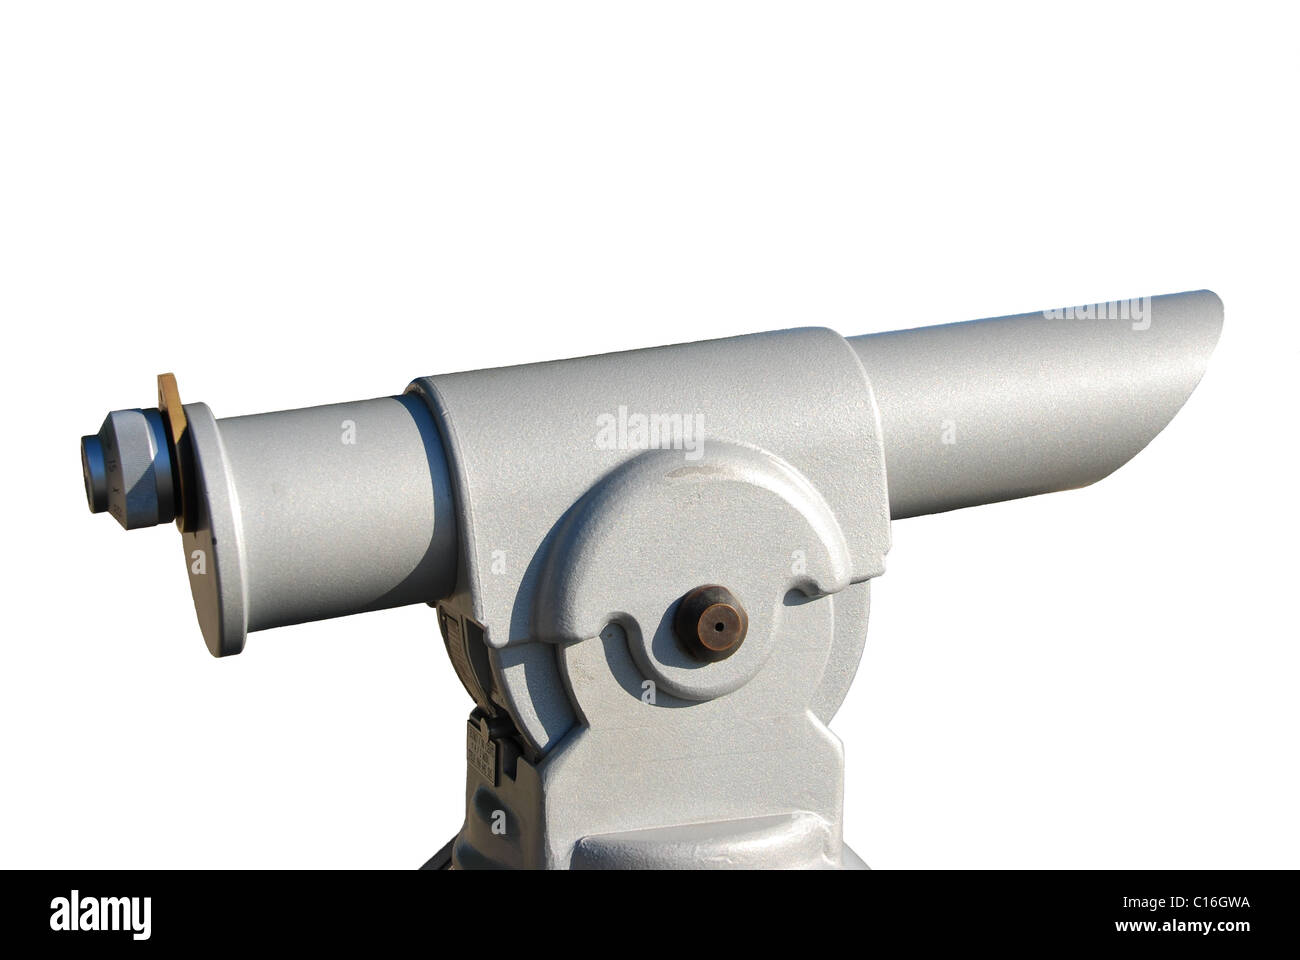 photo of a bright gray coin telescope over white - Stock Image